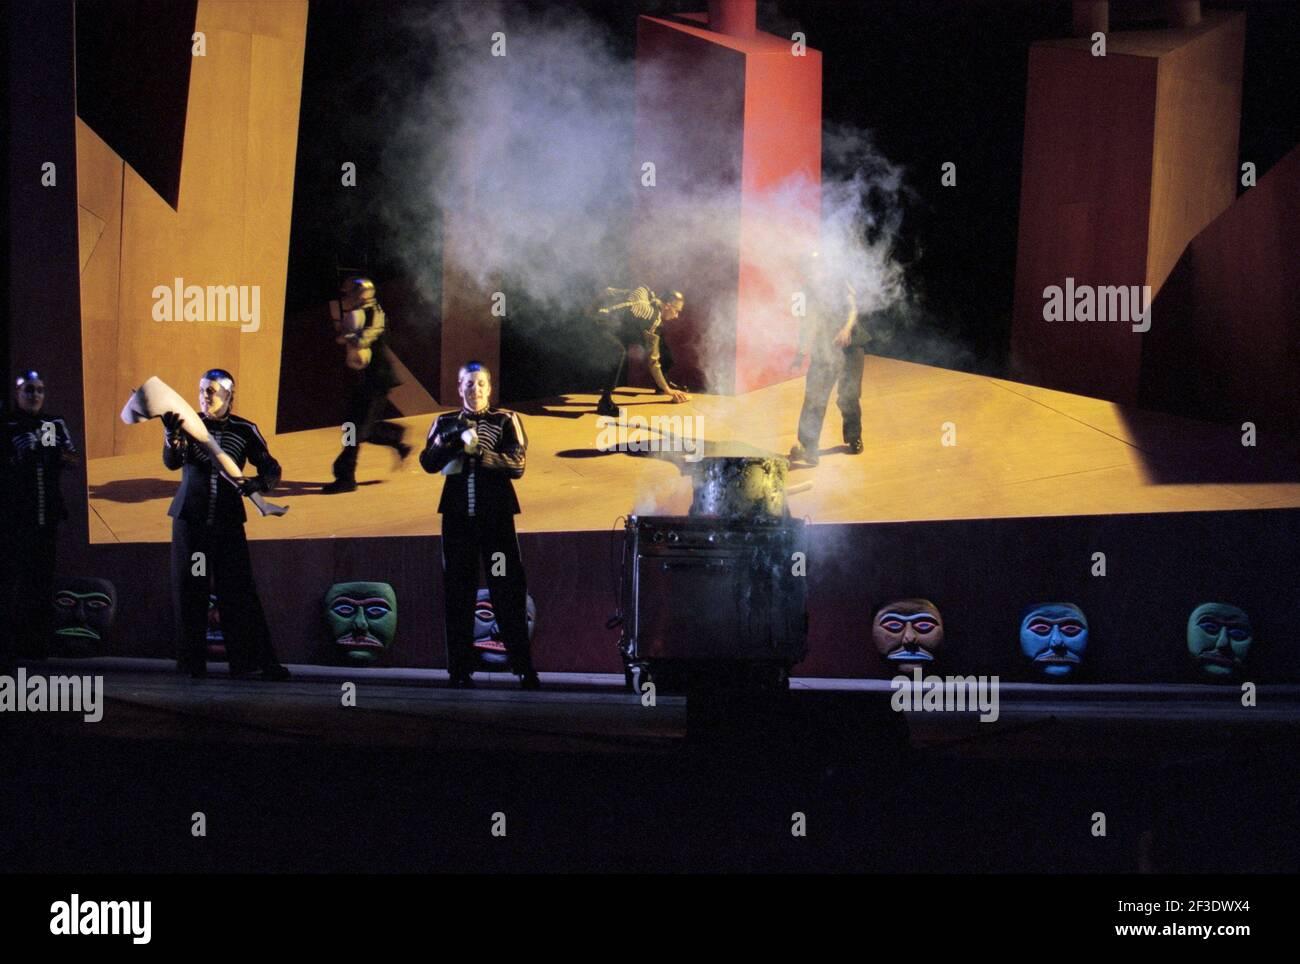 Valkyrie si prepara a bollire gli arti umani in DIE WALKMAN di Wagner alla Royal Opera, Covent Garden, Londra WC2 30/09/1996 direttore: Bernard Haitink design: Nigel Lowery Lighting: Pat Collins regista: Richard Jones Foto Stock